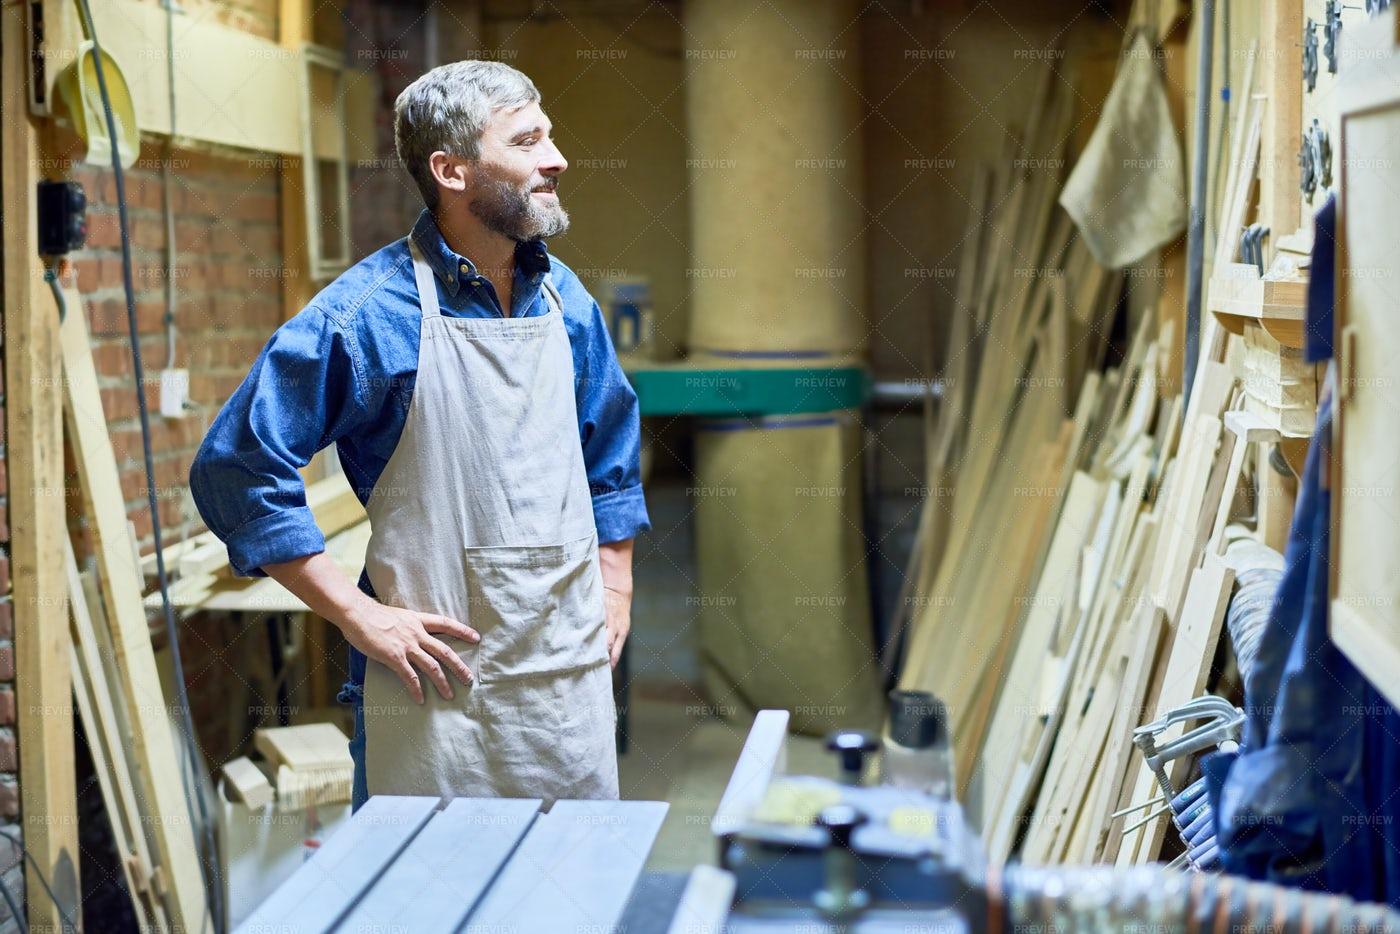 Bearded Carpenter In Storage Room: Stock Photos